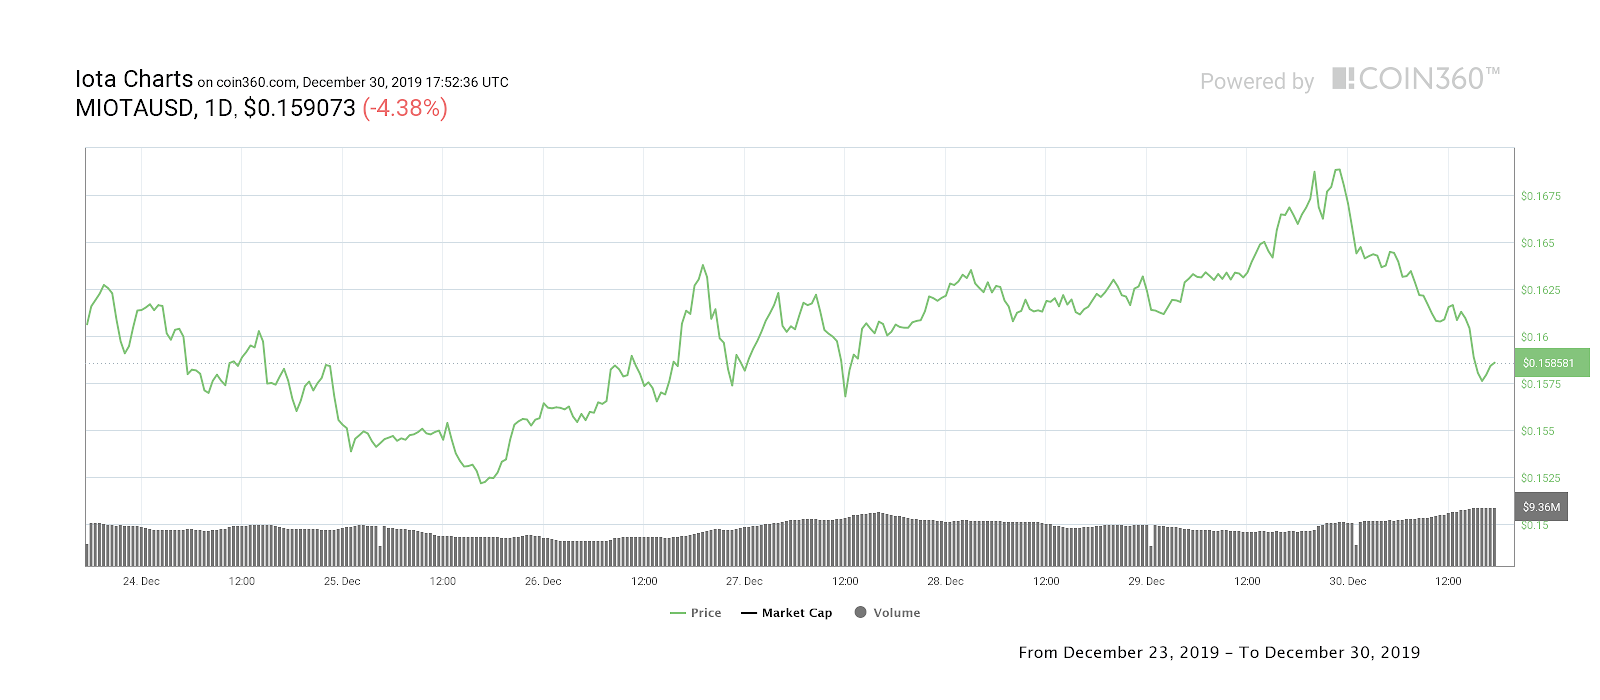 Gráfico de precios de IOTA para siete días. Fuente: Coin360